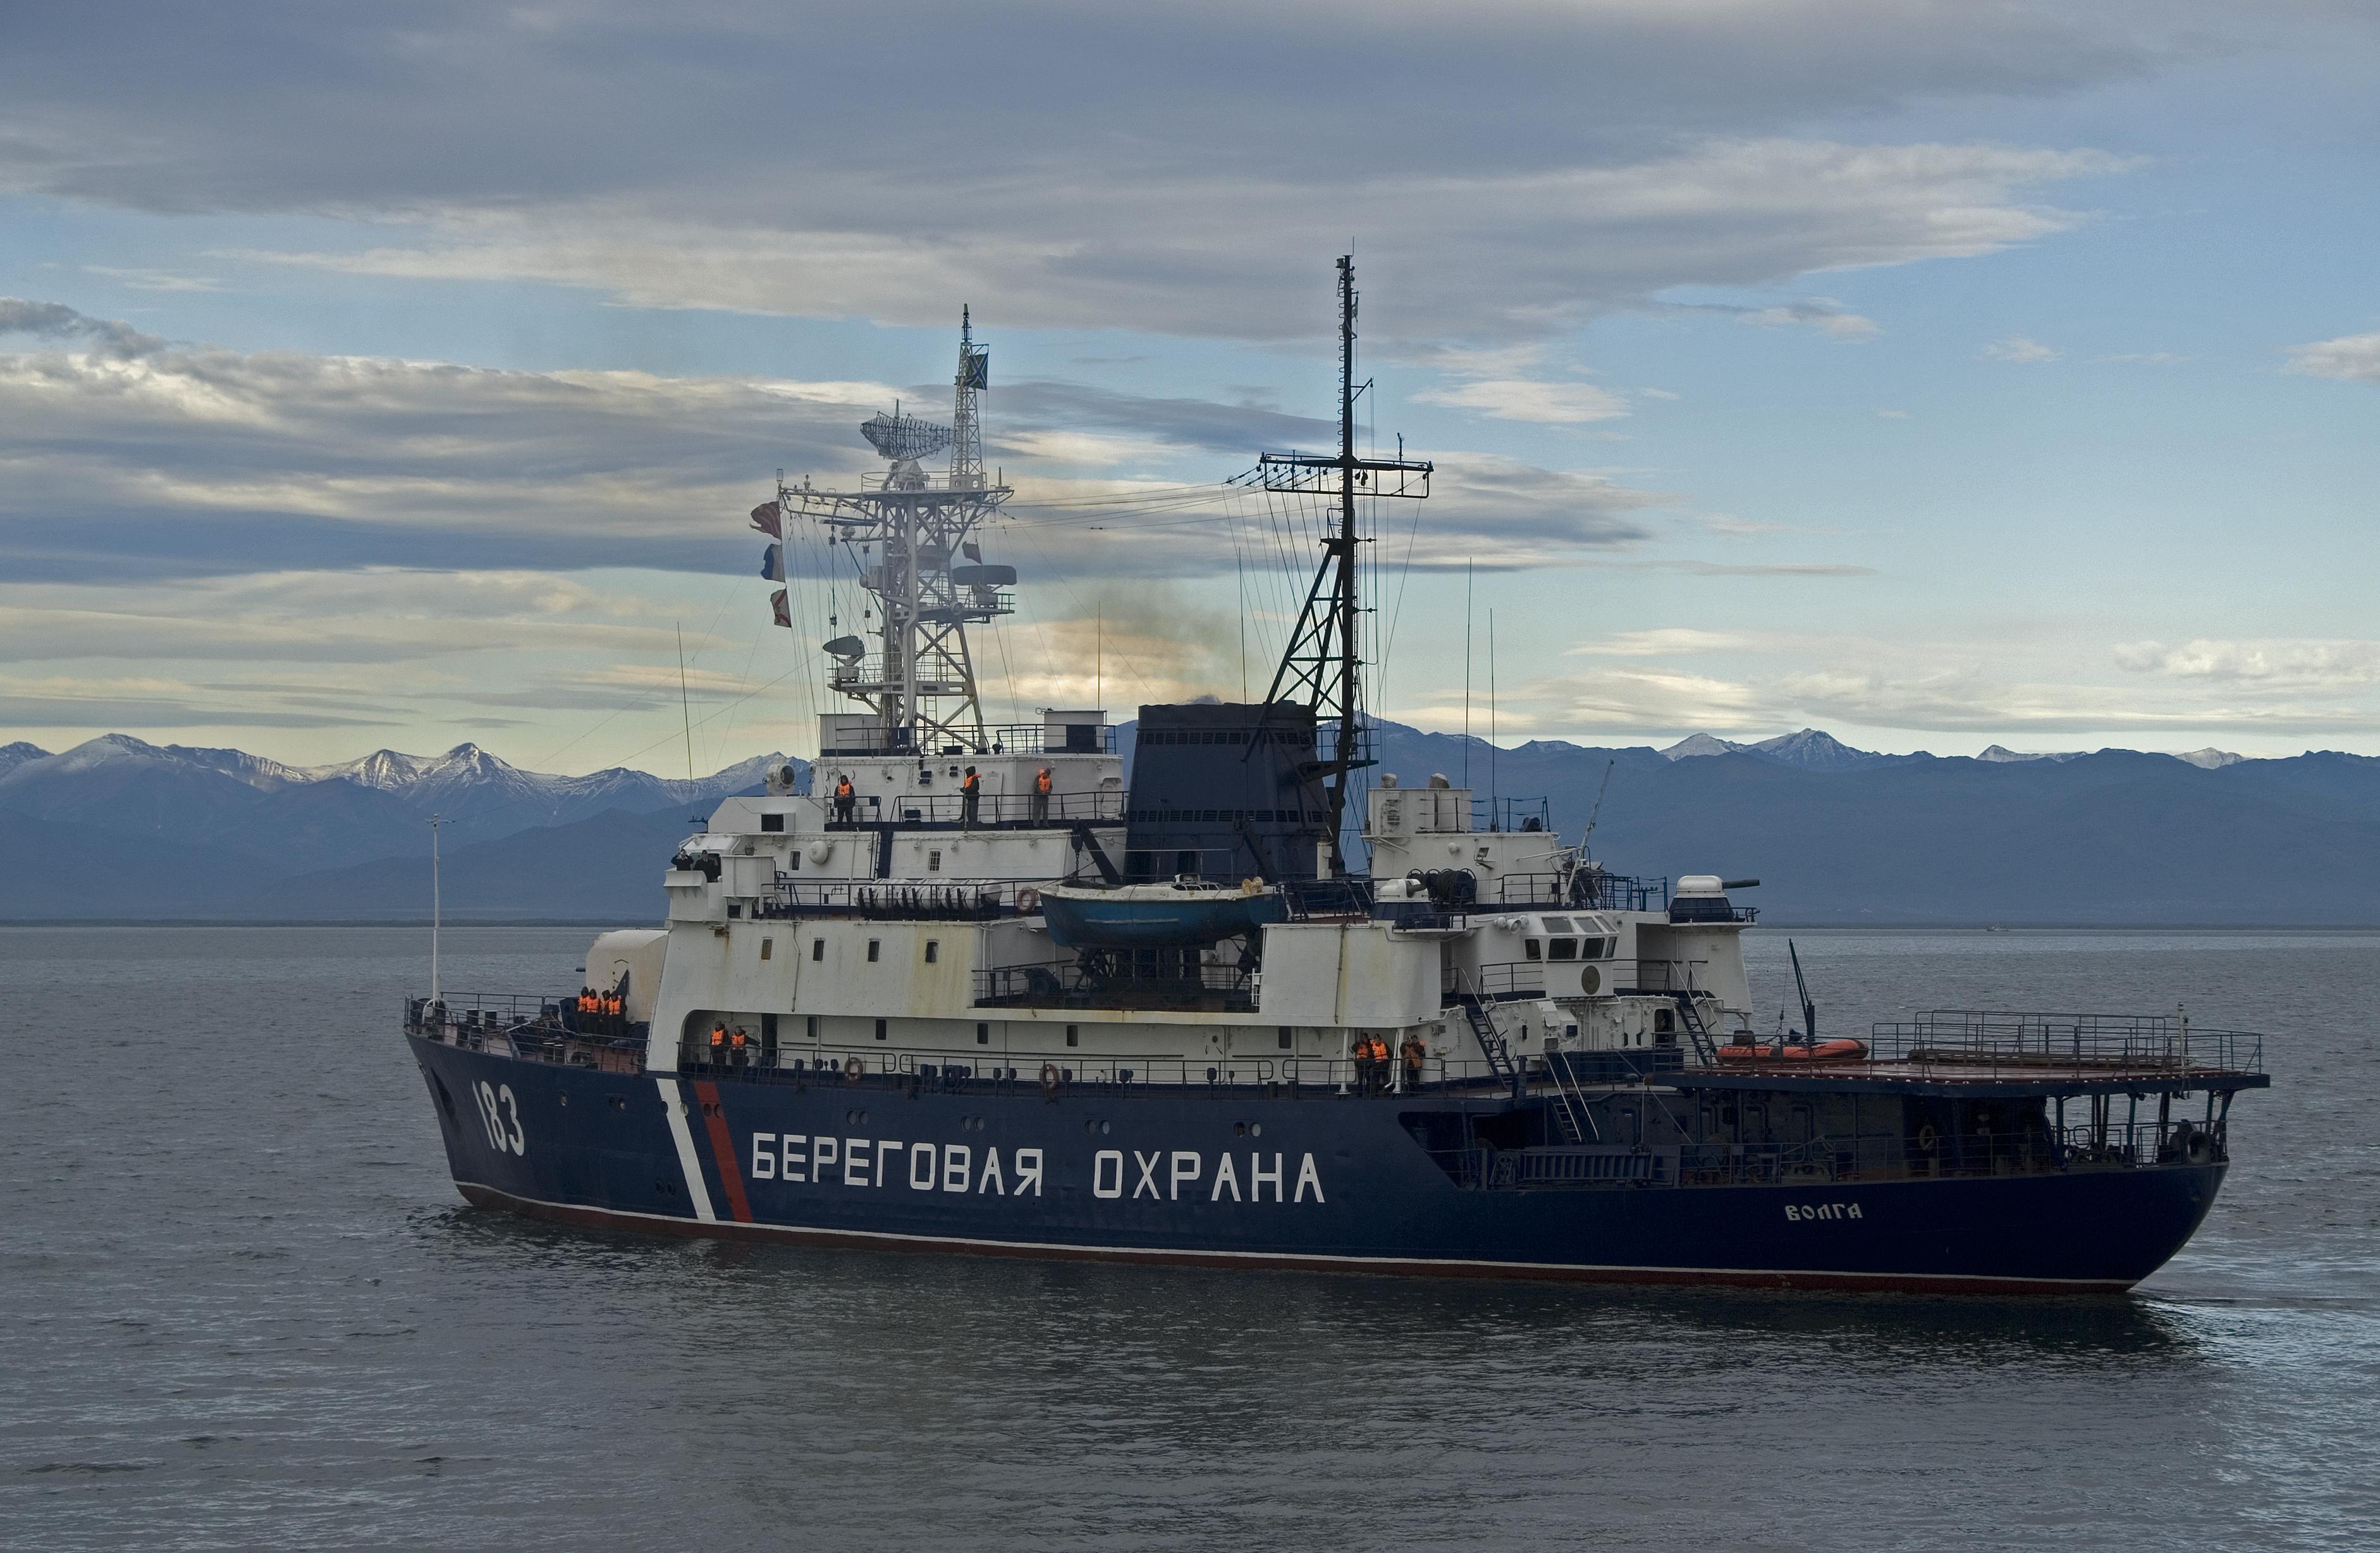 Russian coast guard vessel #183